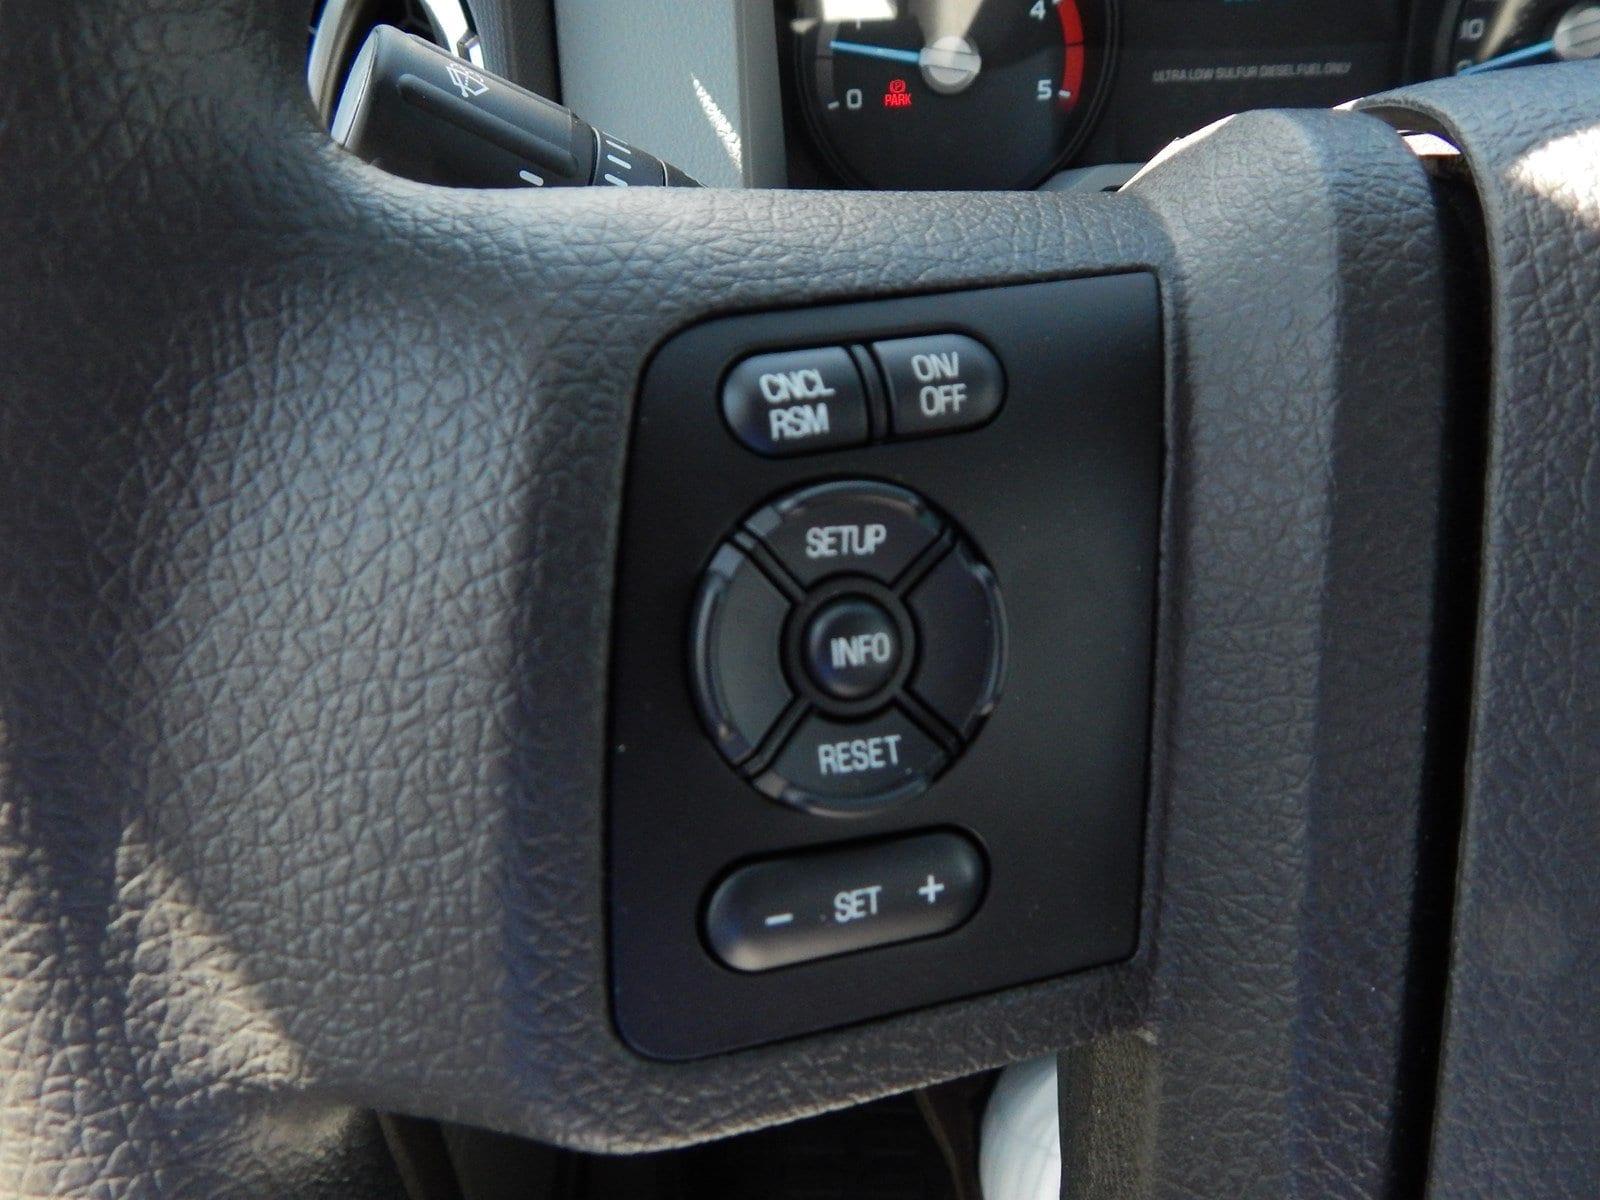 2018 F-650 Regular Cab DRW 4x2, Cab Chassis #68224 - photo 11